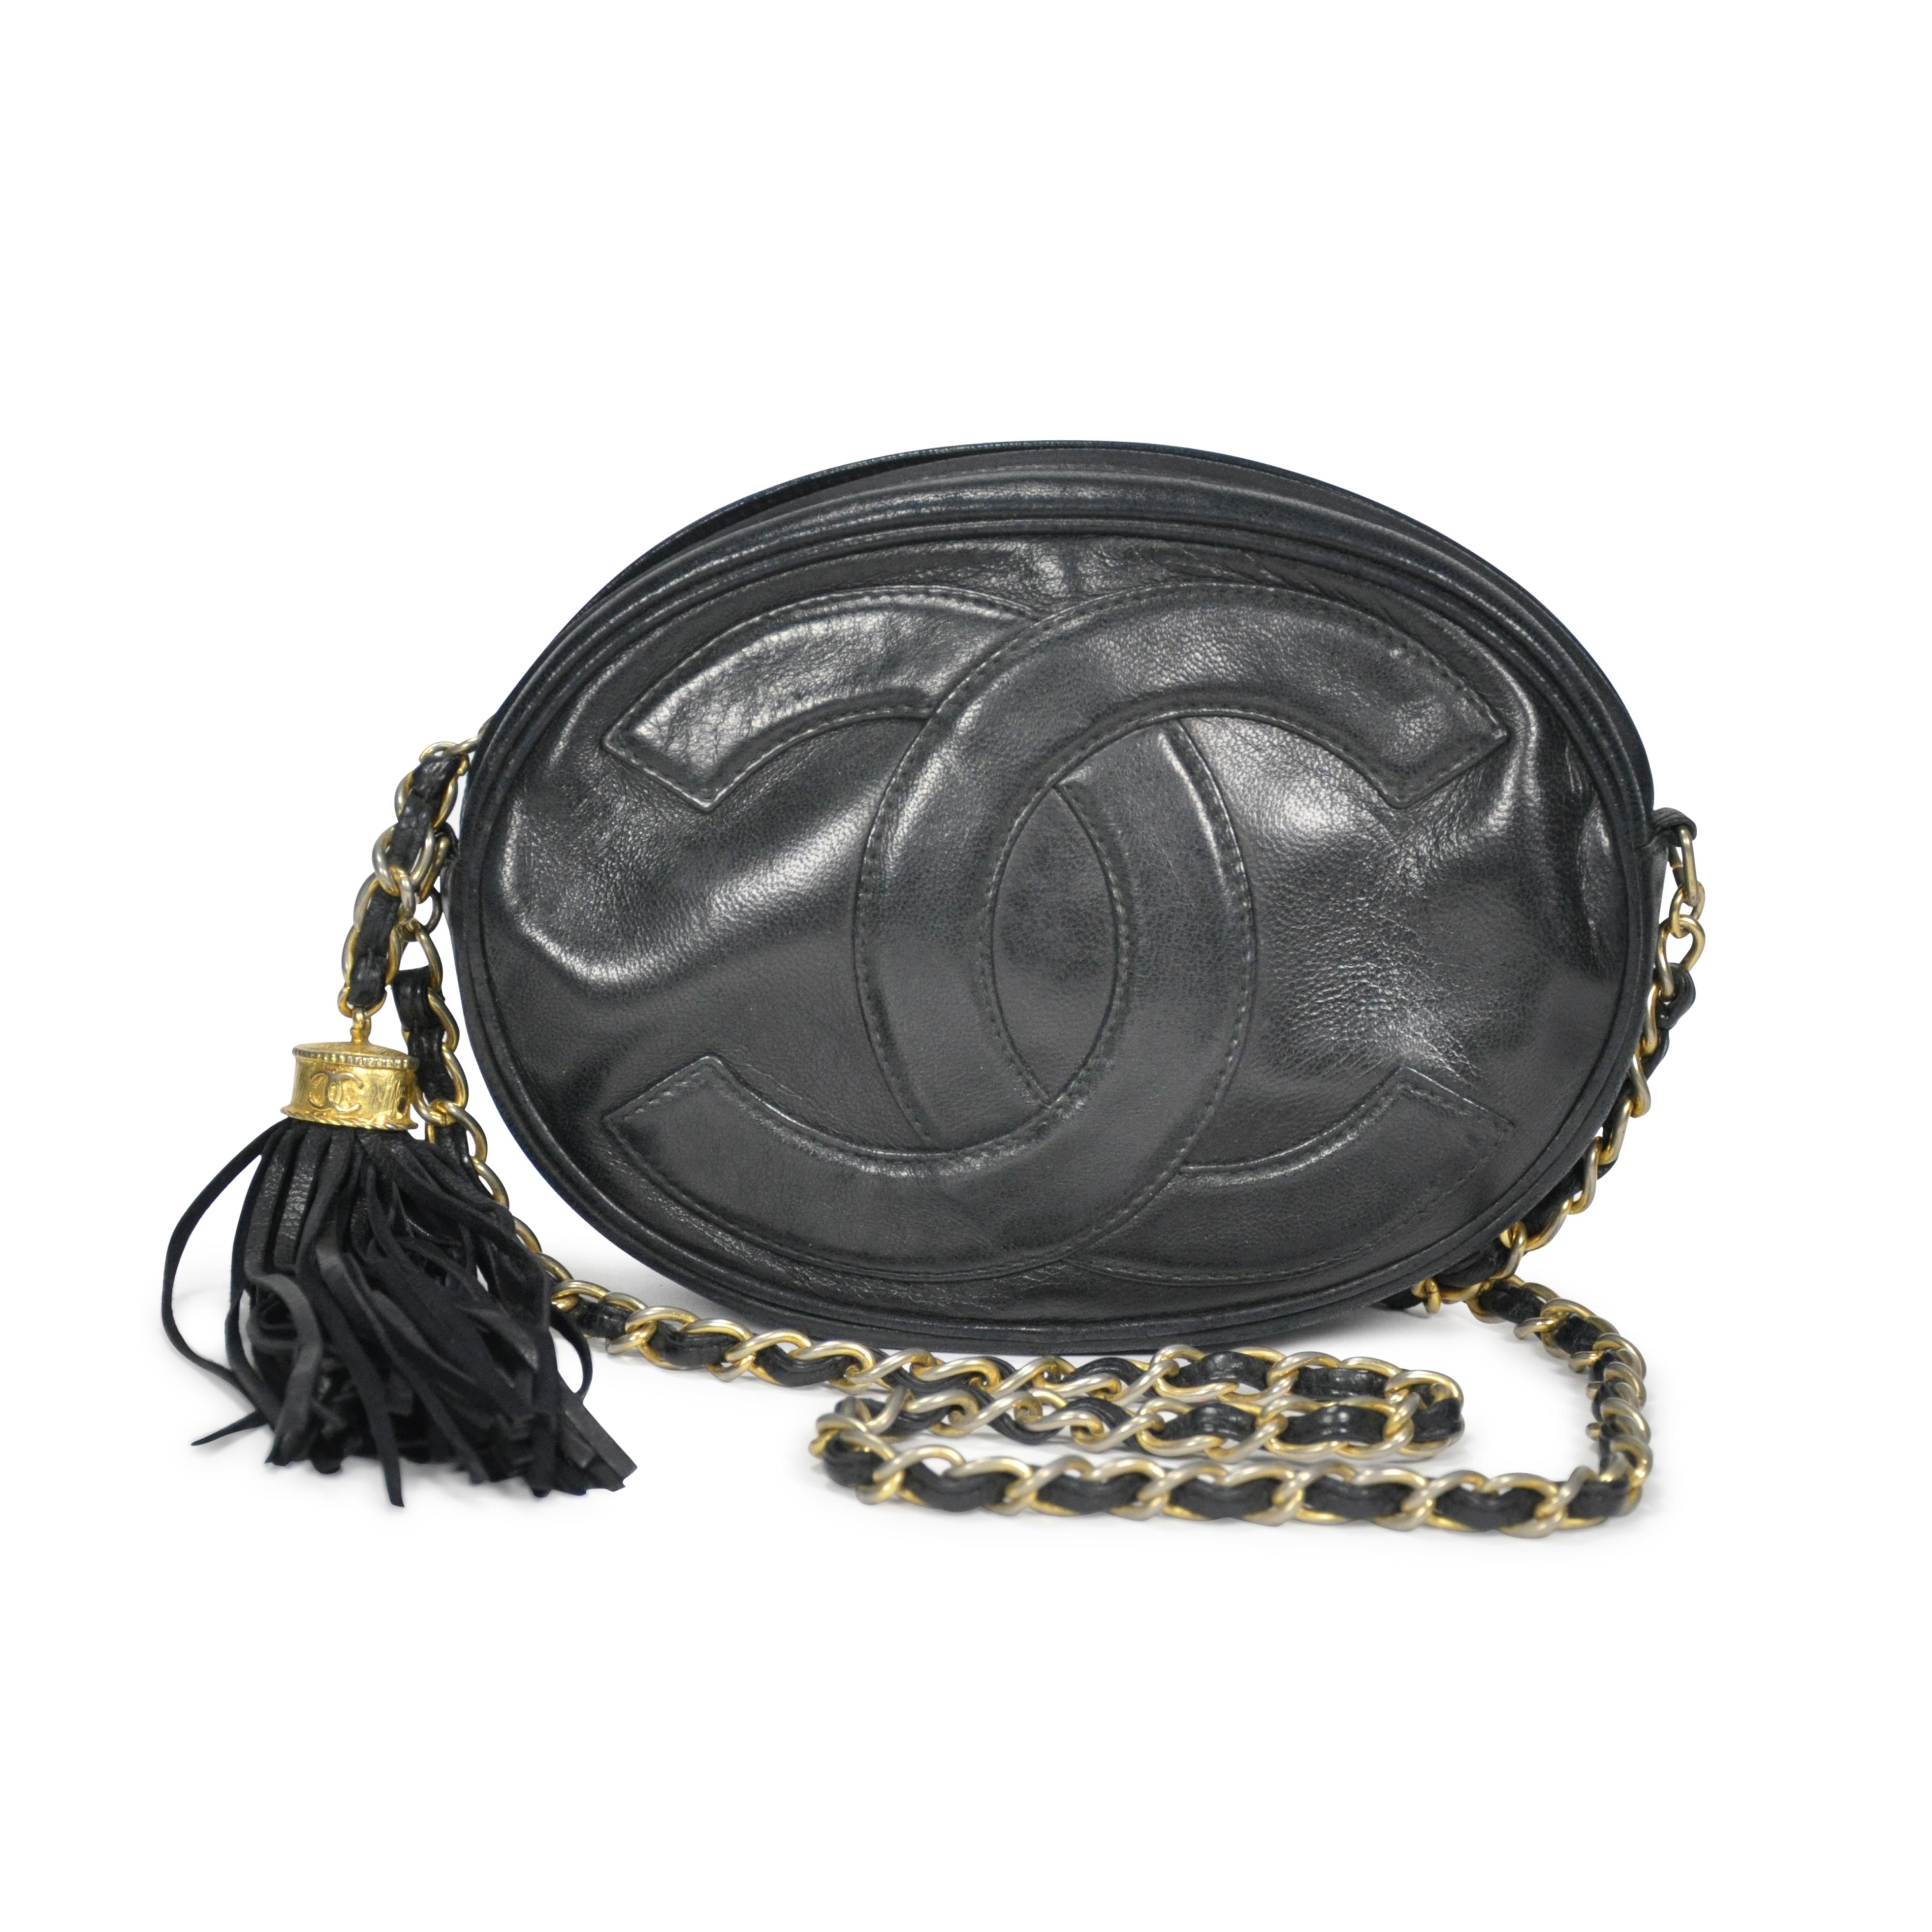 43da86eee6fb Authentic Vintage Chanel Oval Tassel Bag (PSS-201-00005)